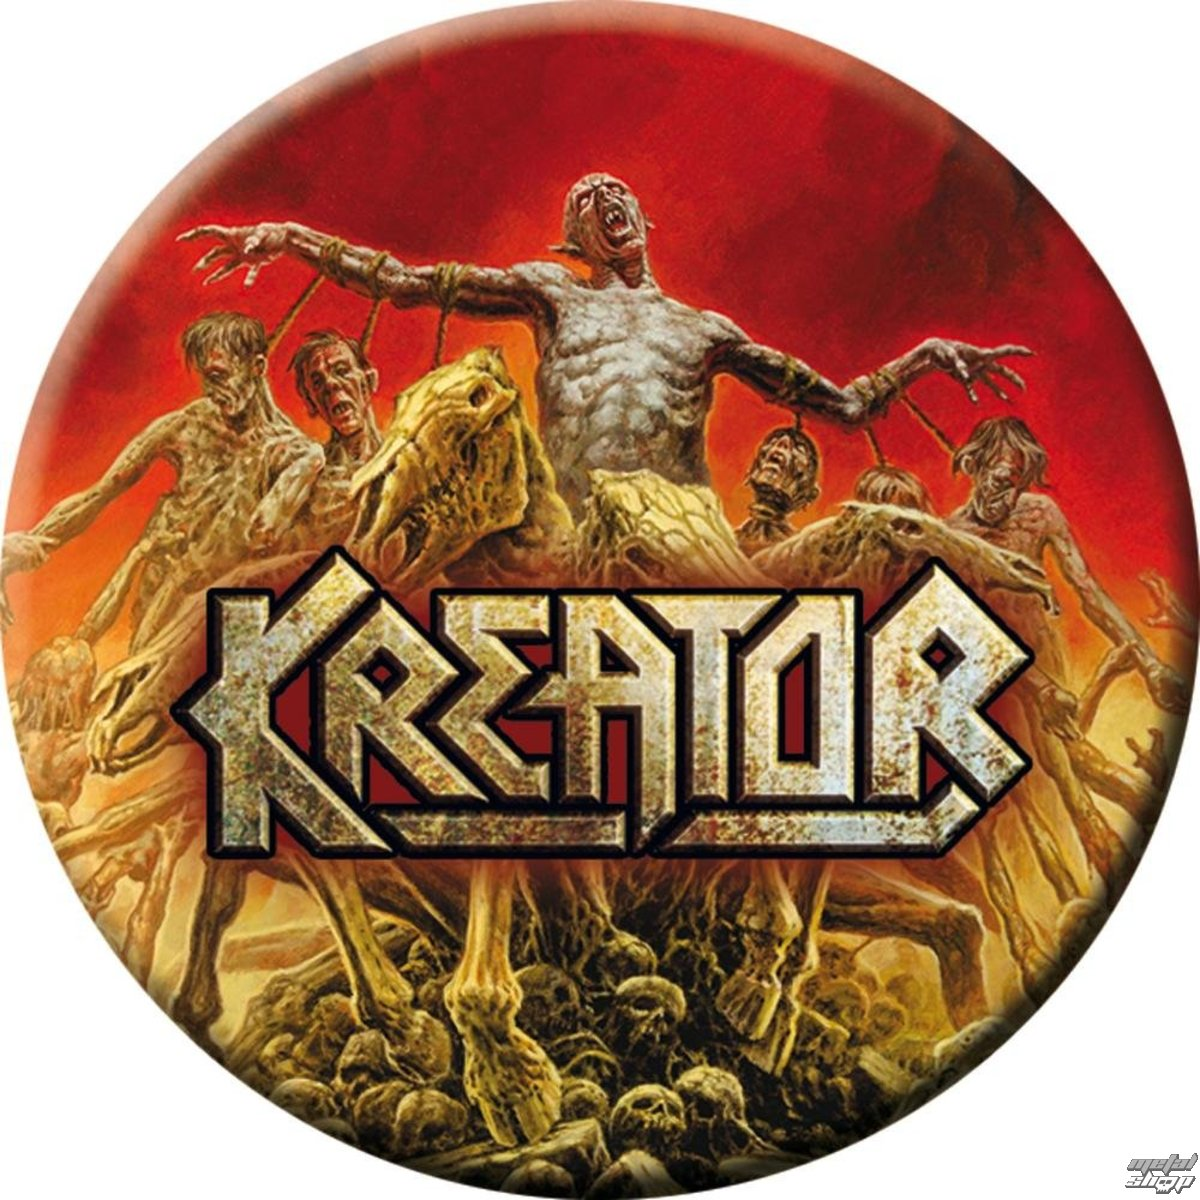 placka KREATOR - Phantom antichrist - NUCLEAR BLAST